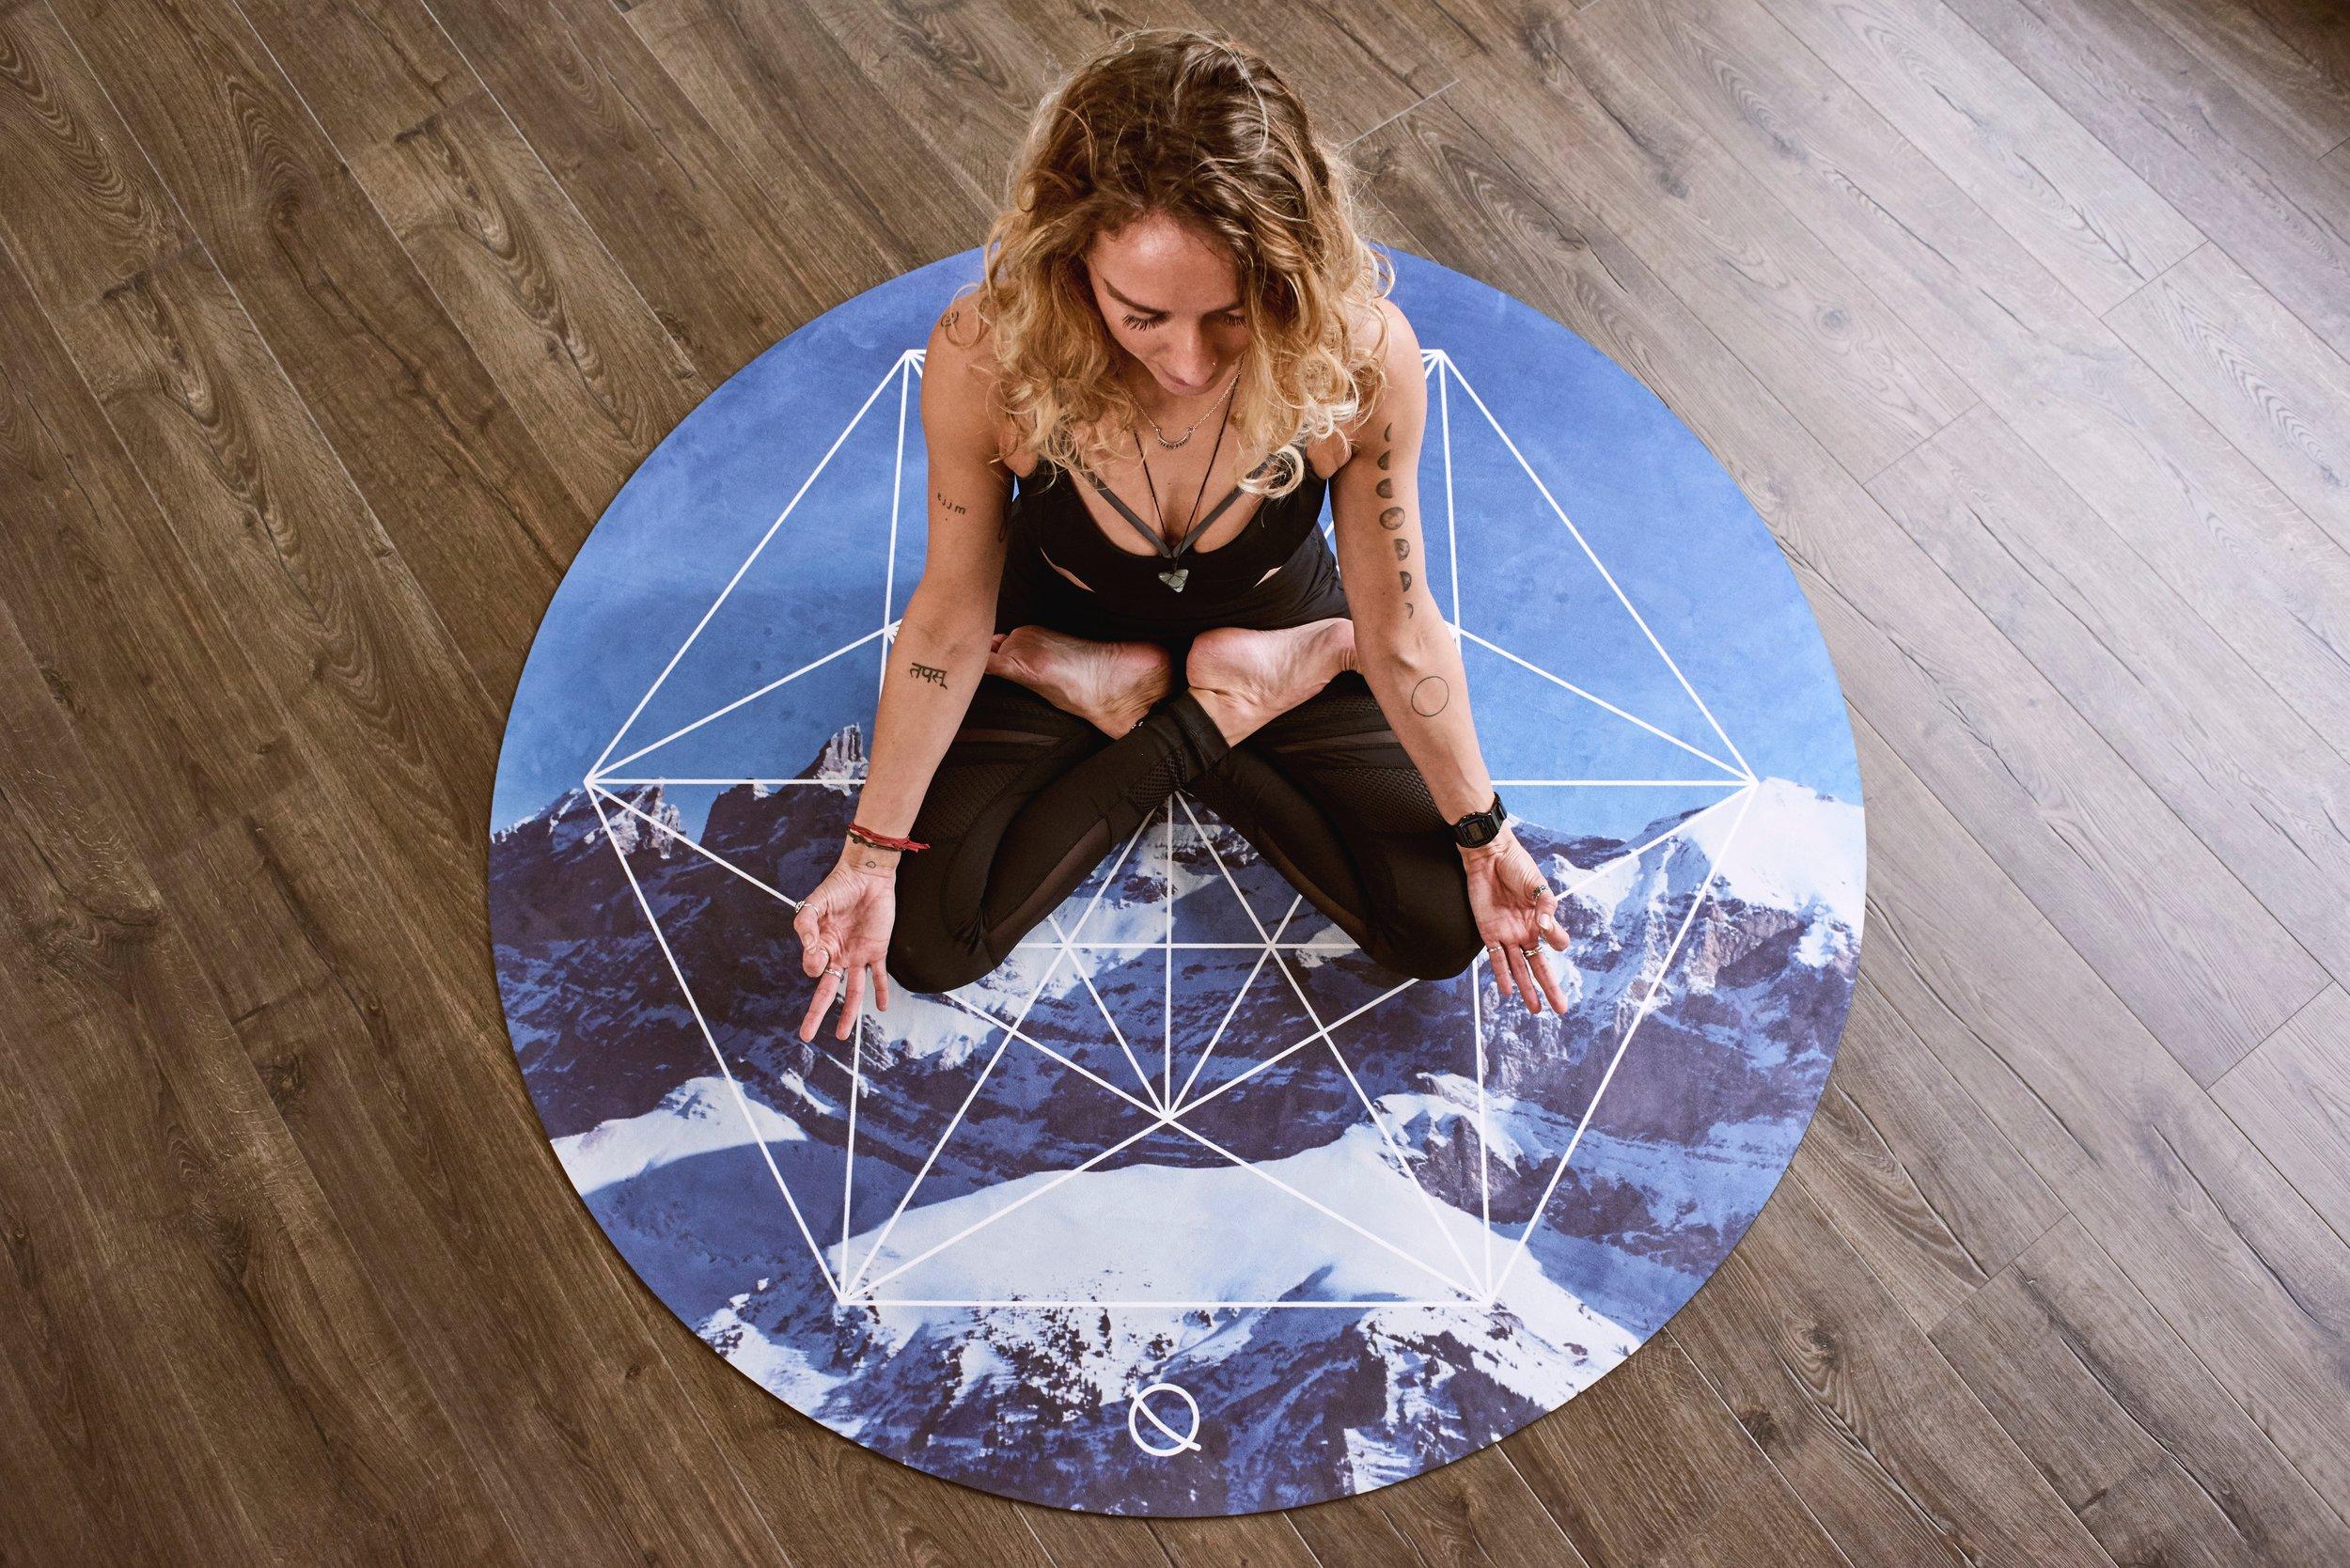 meditation-yoga-center-abbotsford-vancouver-surrey-bc